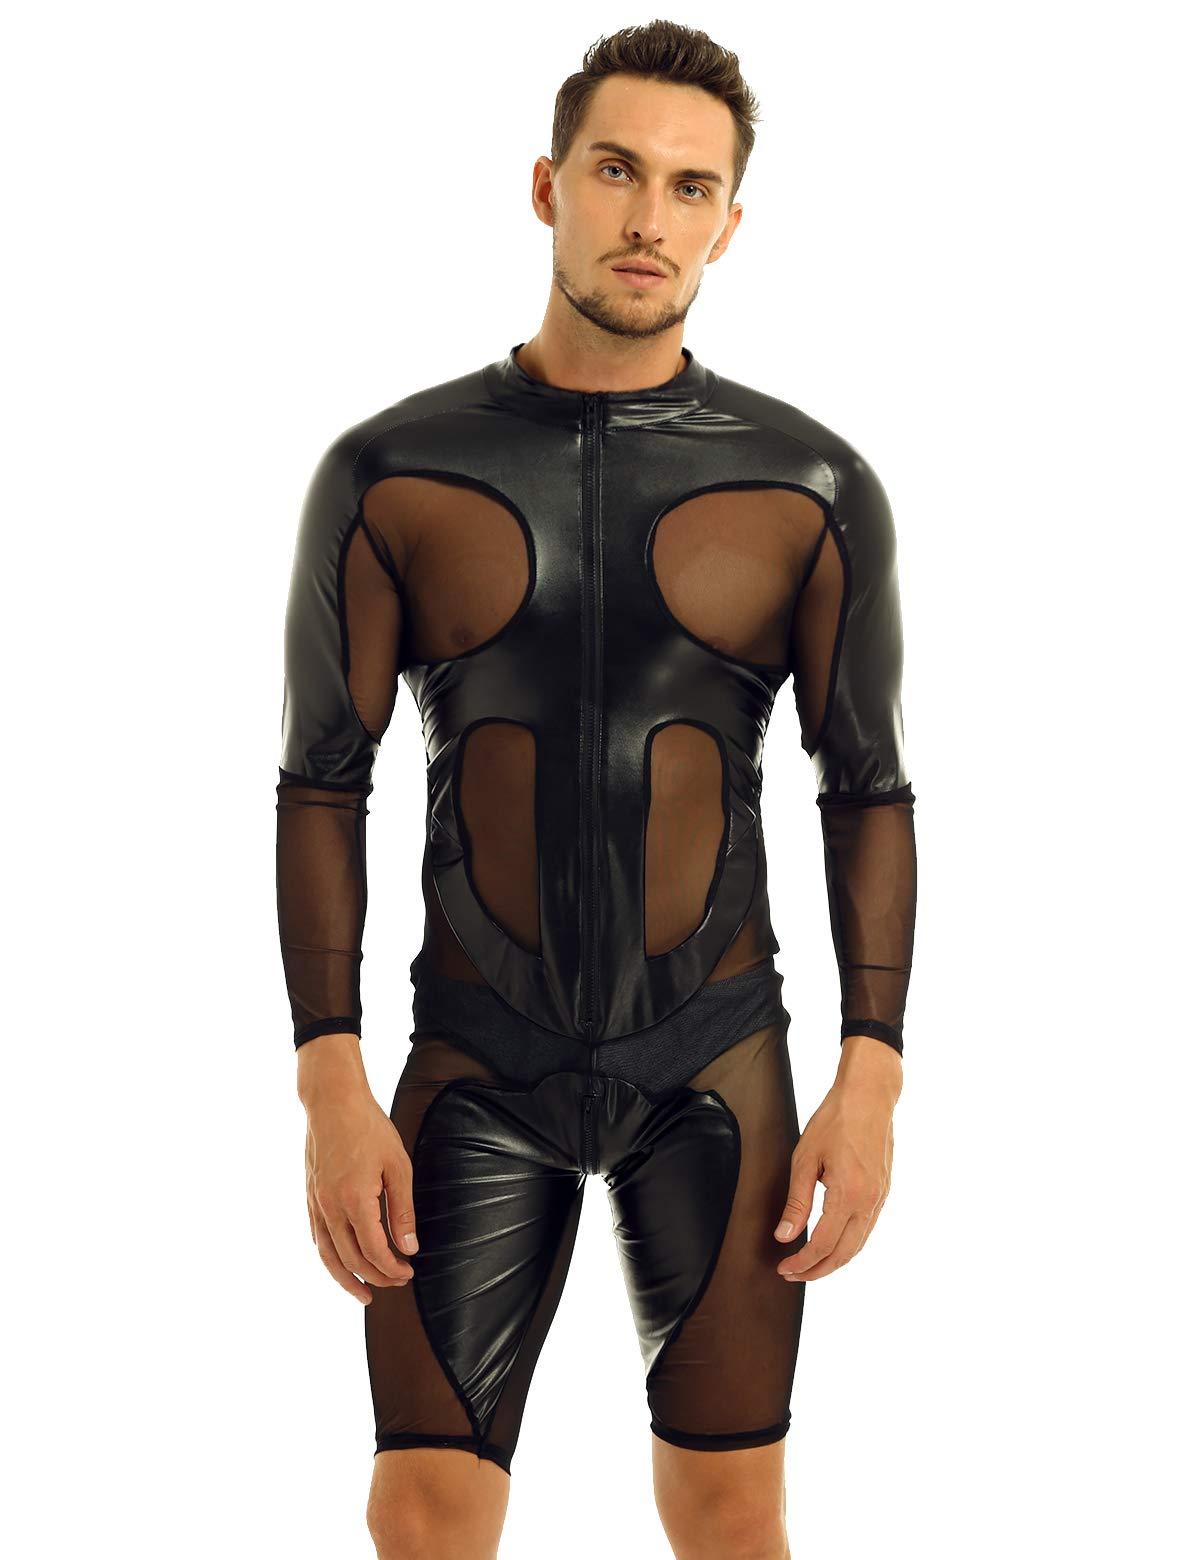 Winying Mens Faux Leather Mesh Splice Long Sleeve Zipper Front Leotard Bodysuit Lingerie Jumpsuit Clubwear Black Xx Large